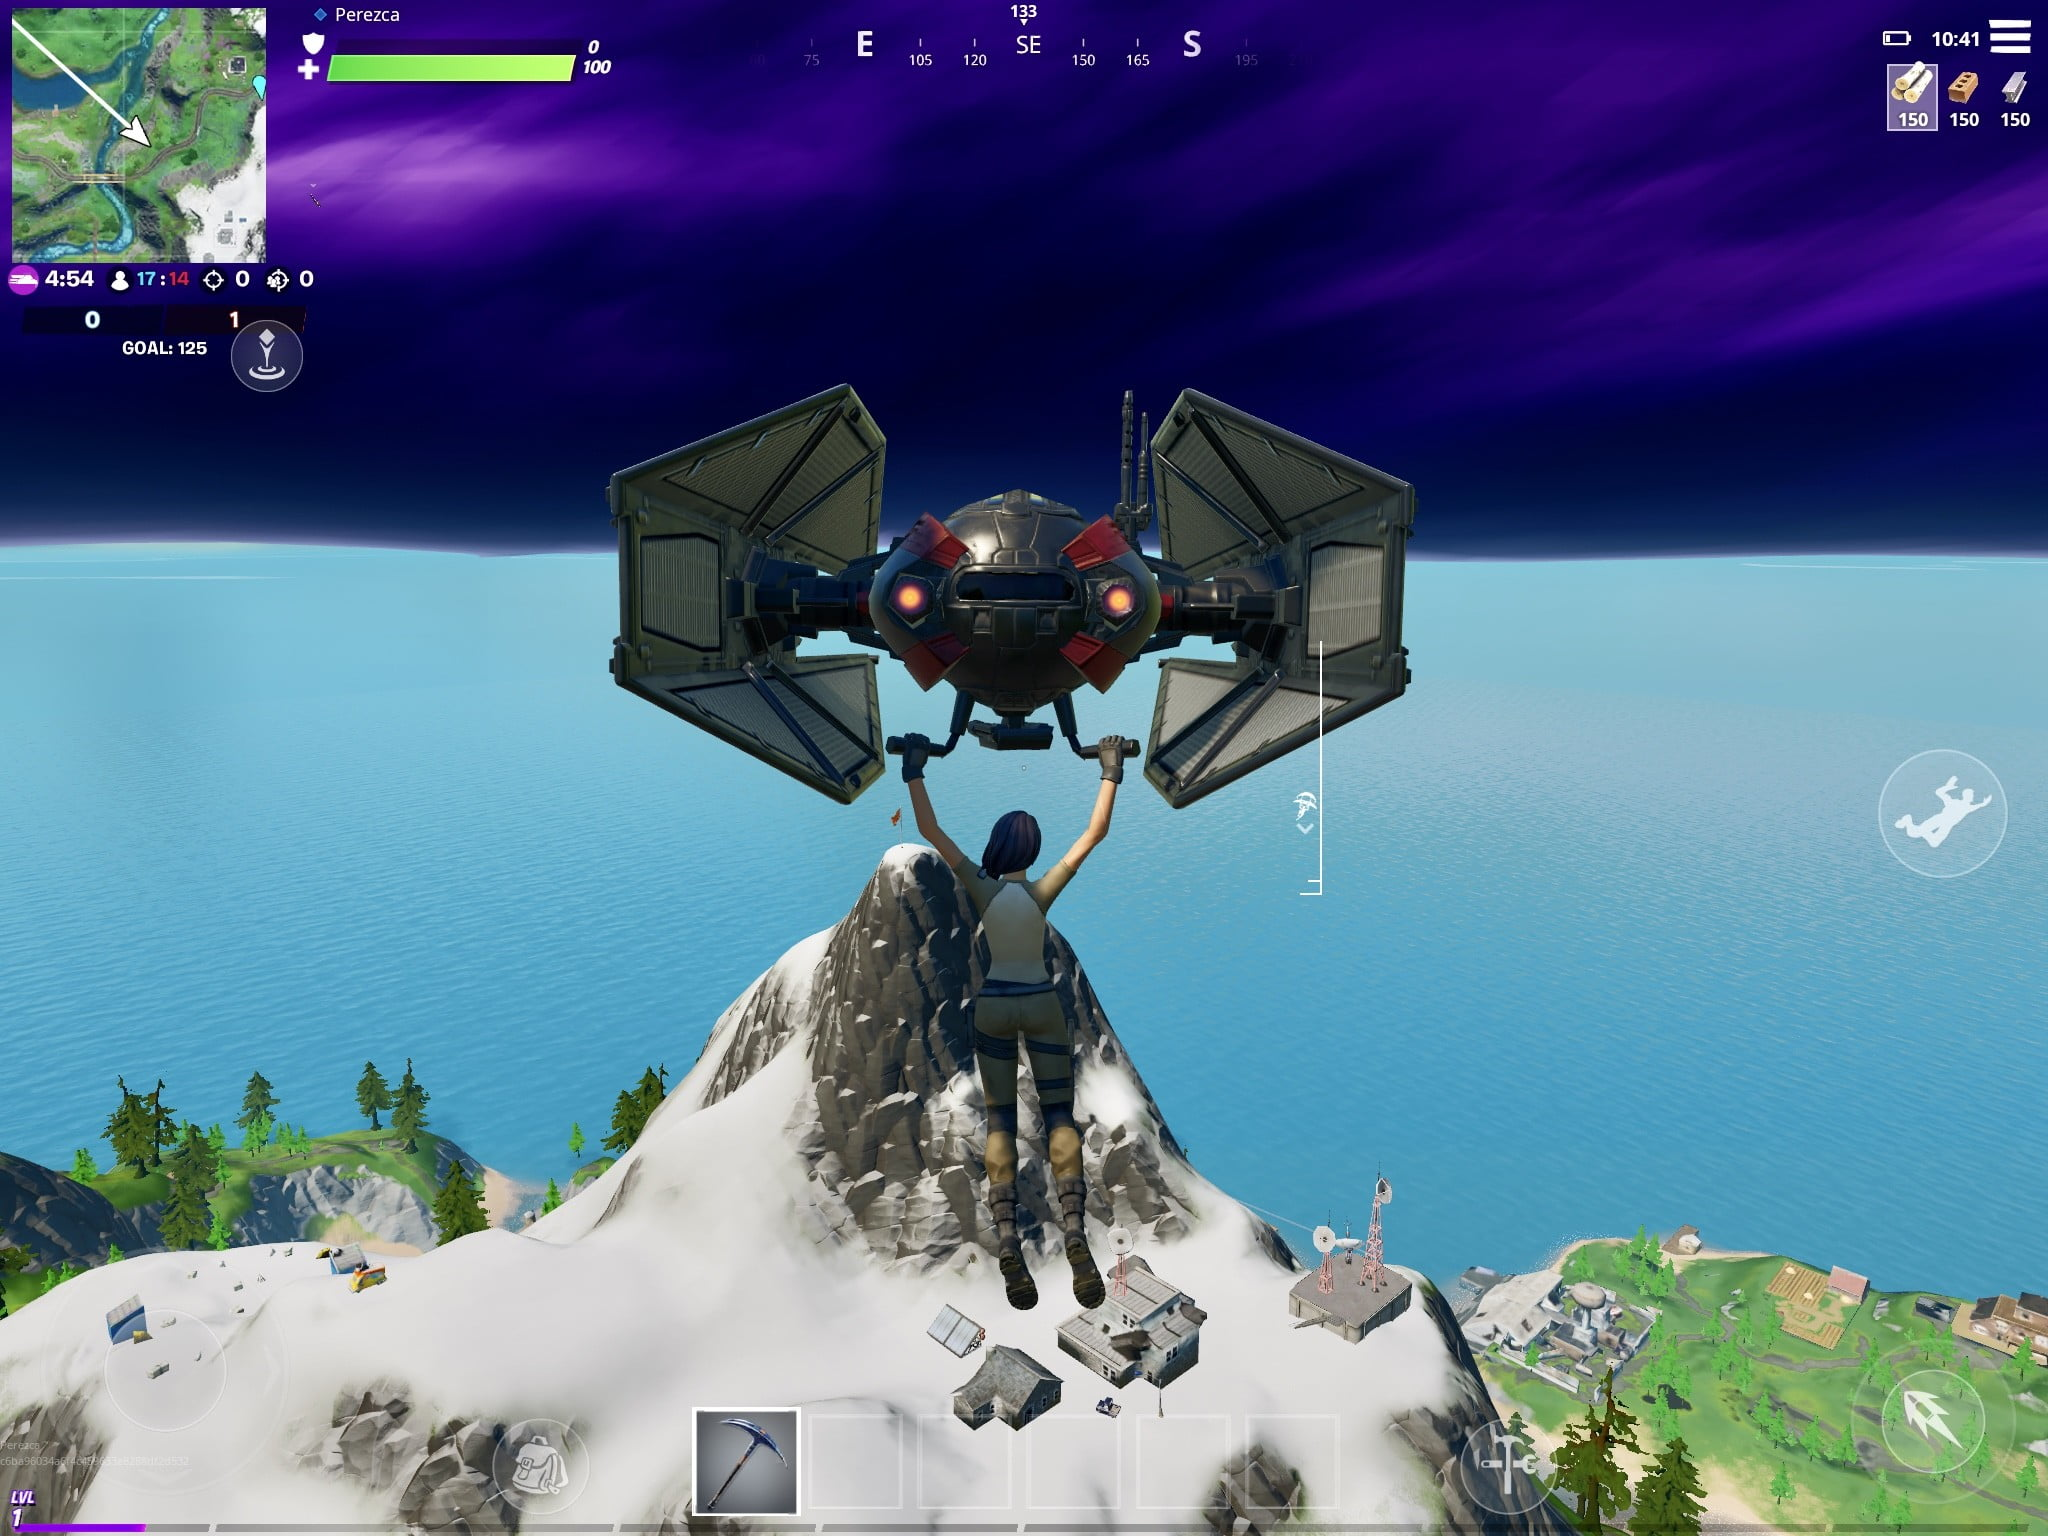 Fortnite - Atterrissage du Mont Kay